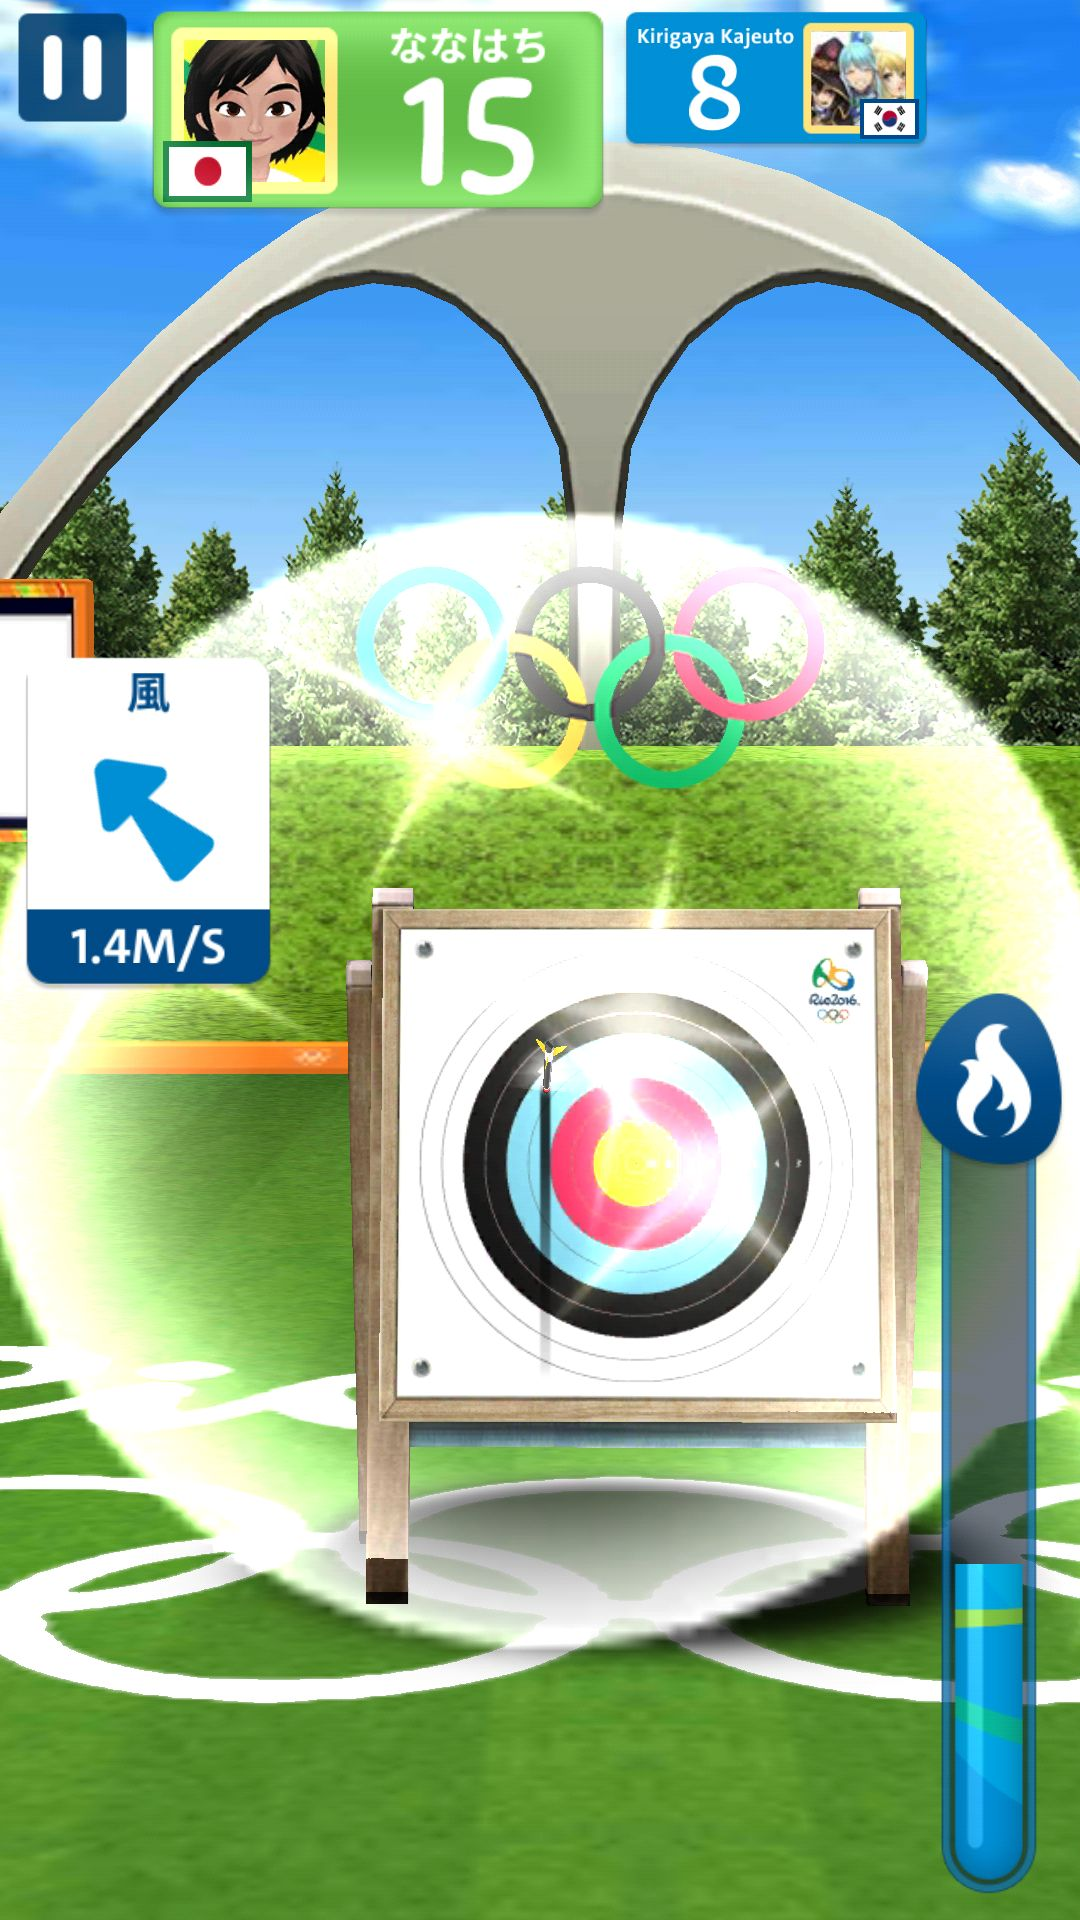 androidアプリ リオ2016オリンピック ゲームズ攻略スクリーンショット3